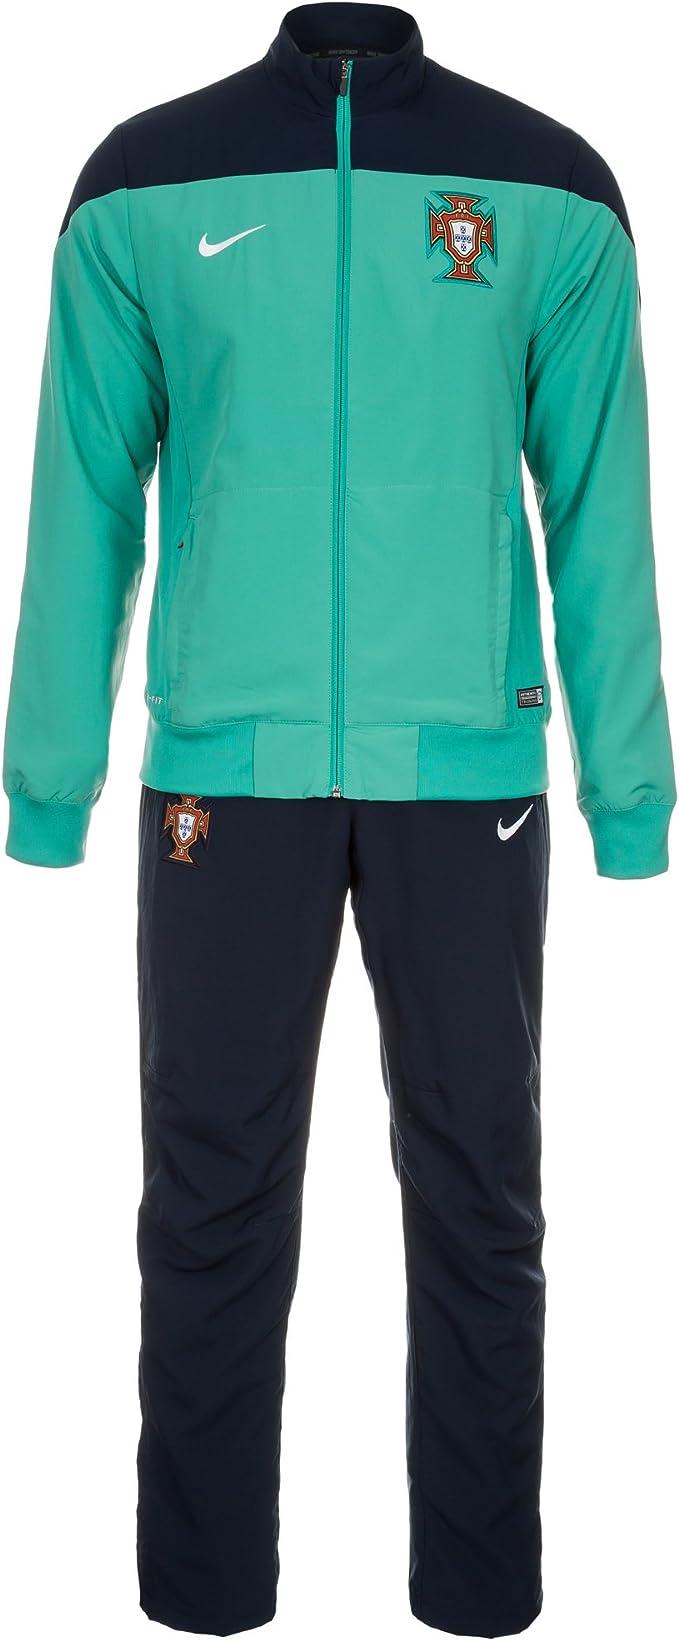 Nike Chándal Portugal Entreno -Turquesa- 2014: Amazon.es: Deportes ...